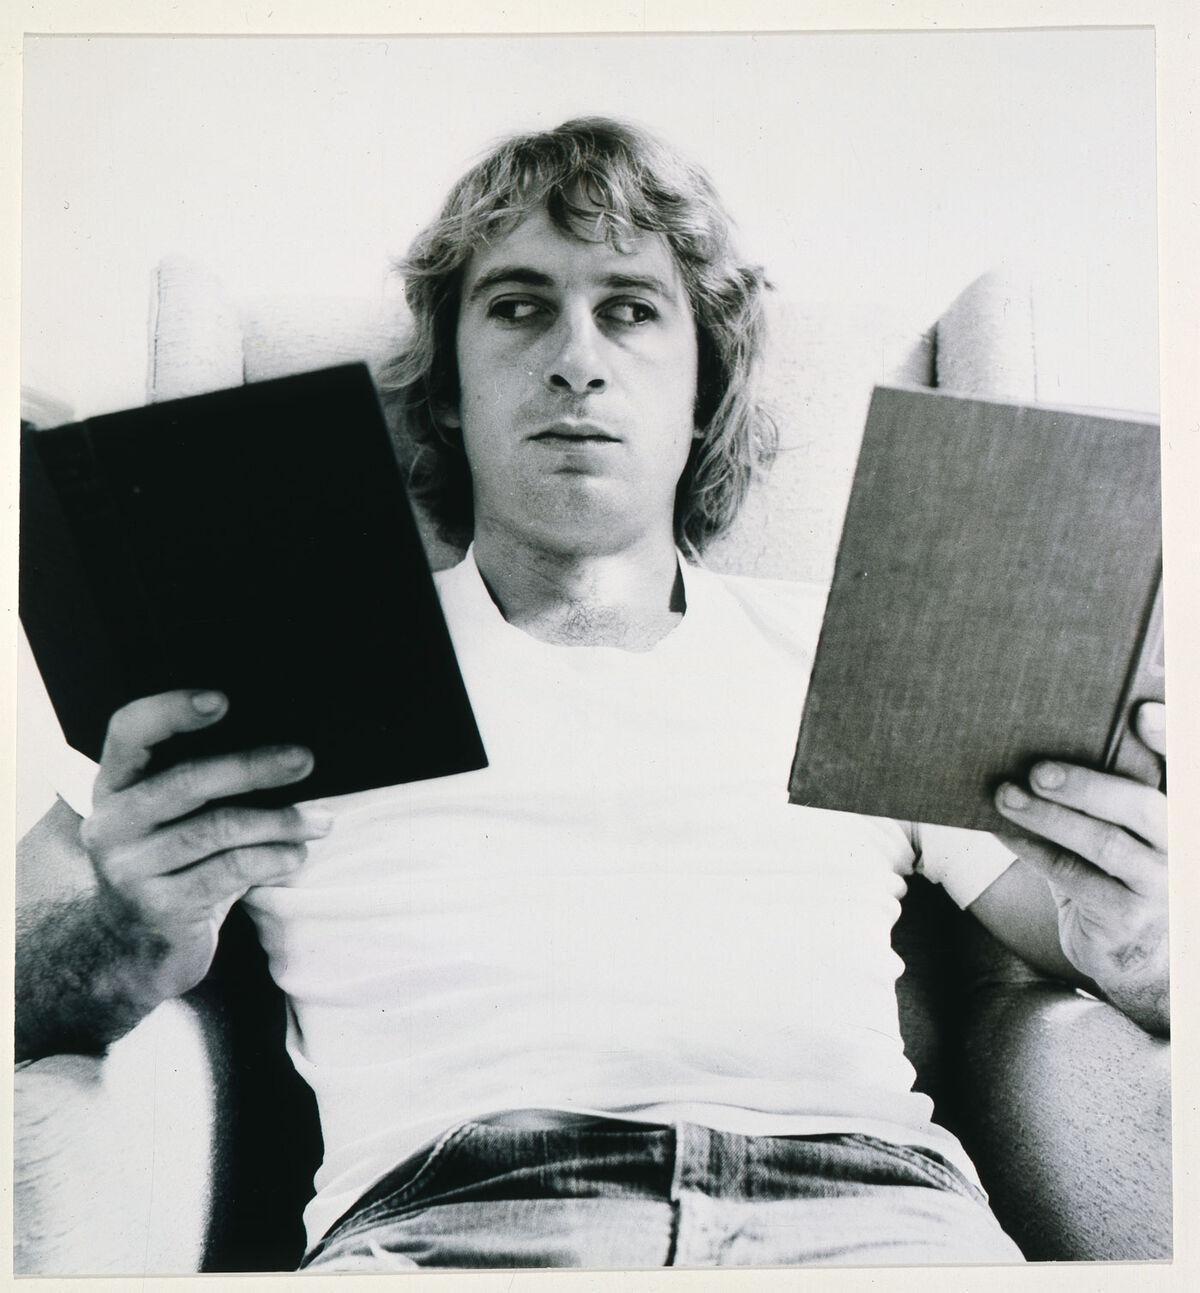 Portrait of William Wegman. Courtesy of the artist.